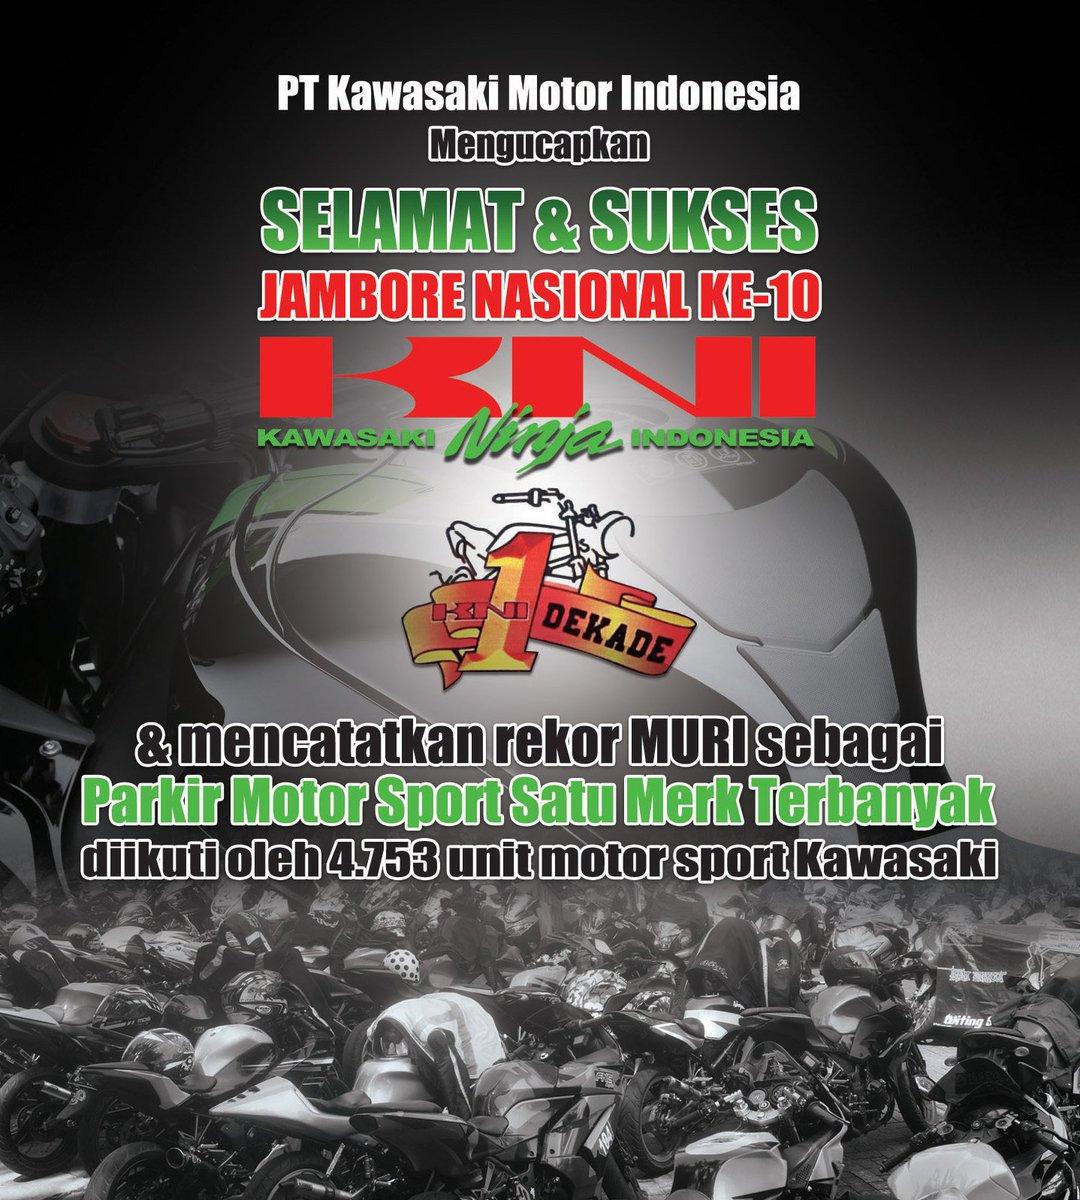 Kawasaki Indonesia בטוויטר Selamat Kepada Kni Yang Berhasil Tercatat Dalam Muri Dengan Rekor Parkir Motor Sport Satu Merk Terbanyak